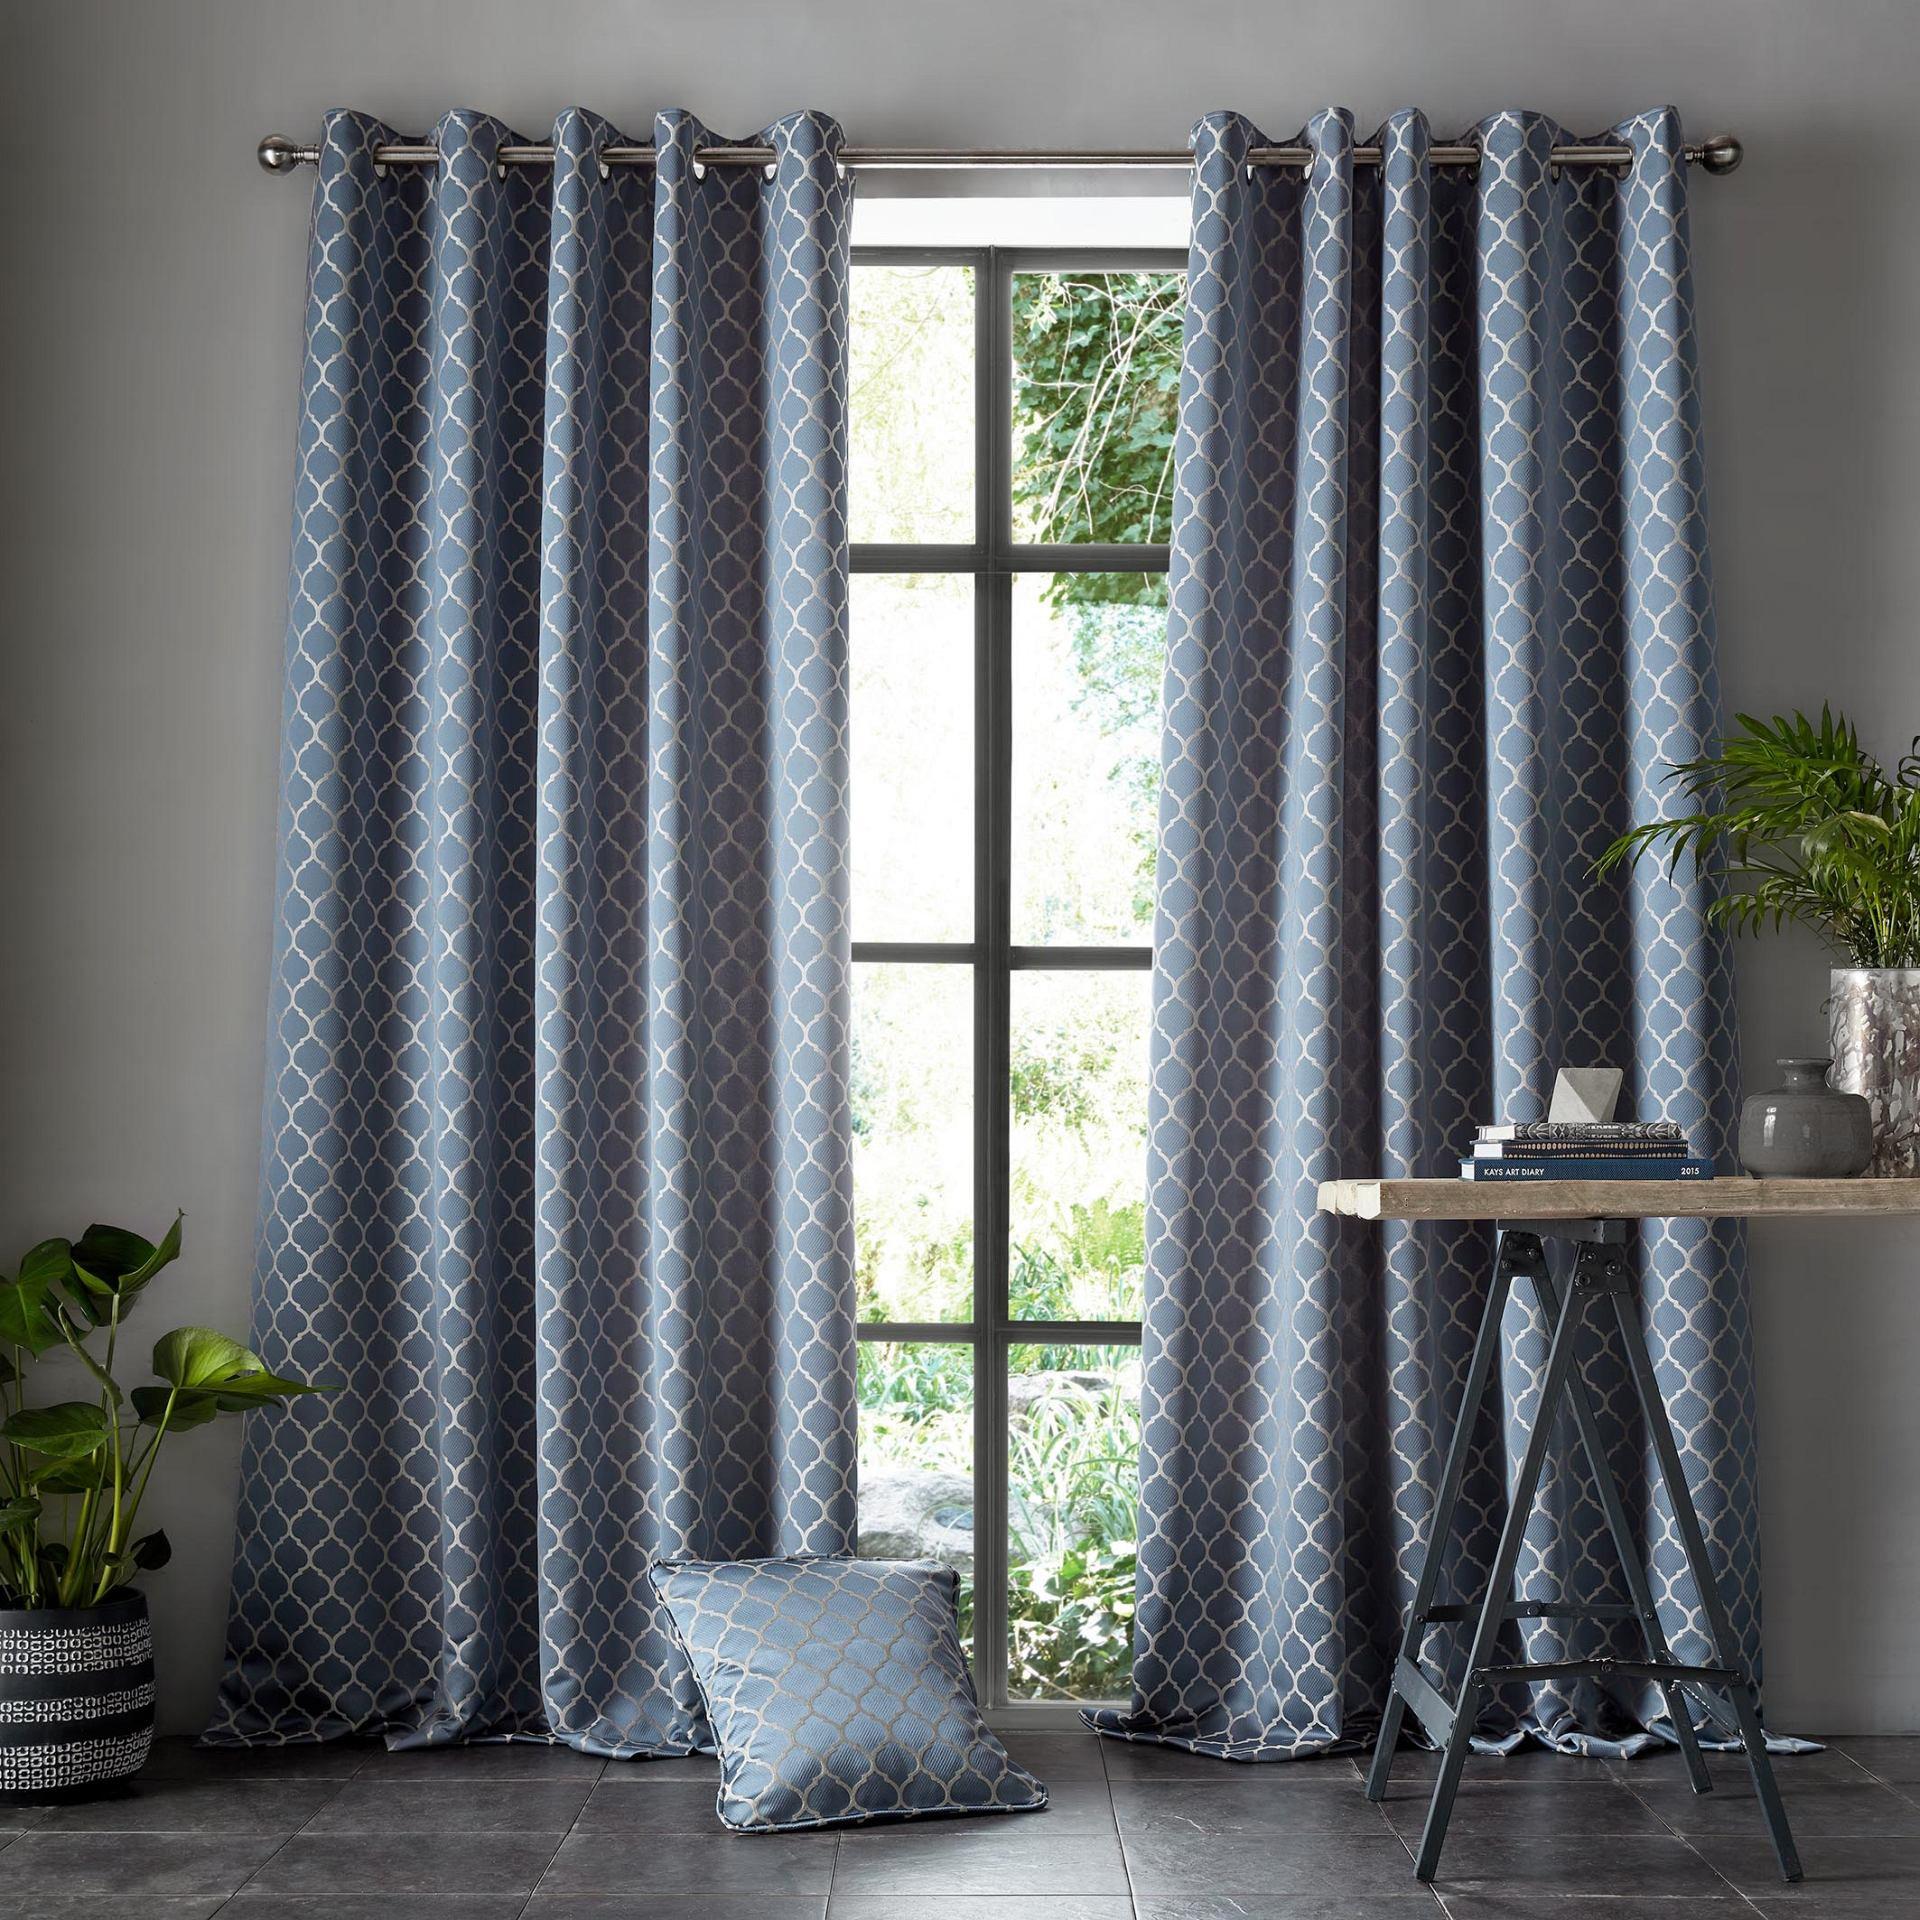 Village-fabrics-Curtains-Aldbury-Danube-FINAL